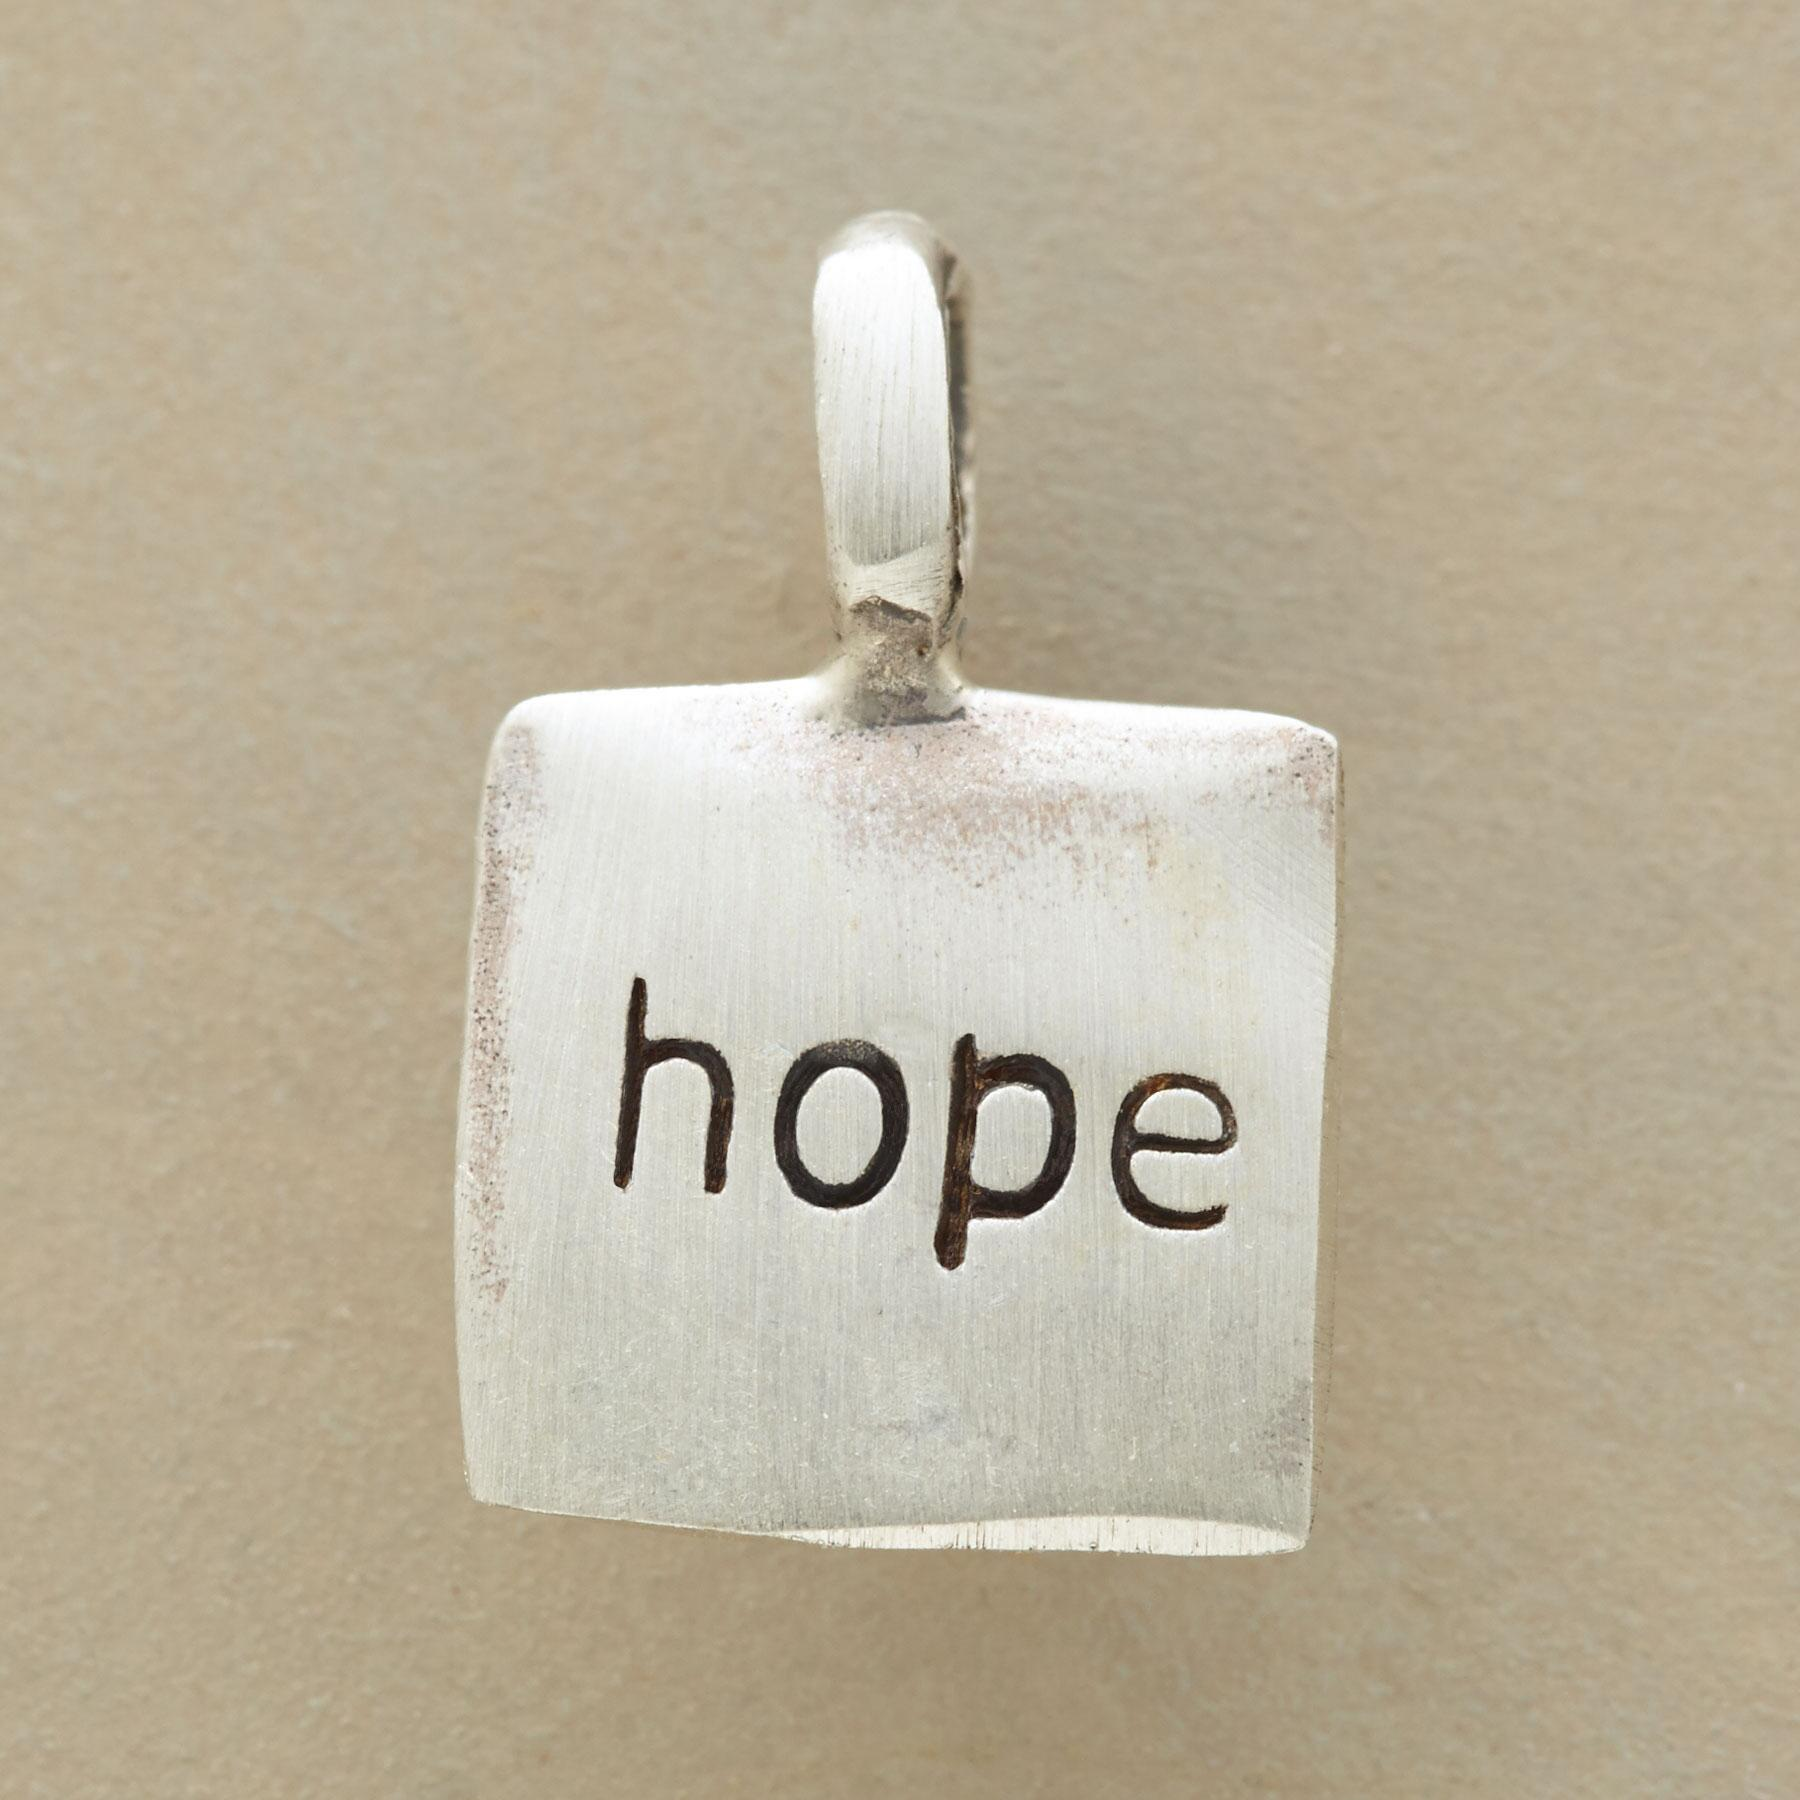 HOPE CHARM: View 1